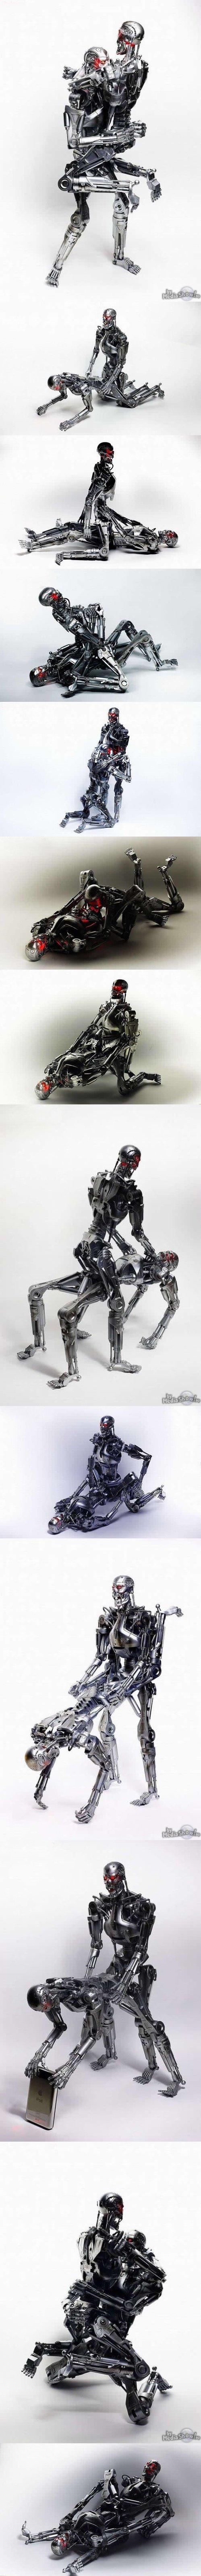 Terminator Kamasutra. Terminator Kamasutra....... .... i'll be back.. be back Terminator lol